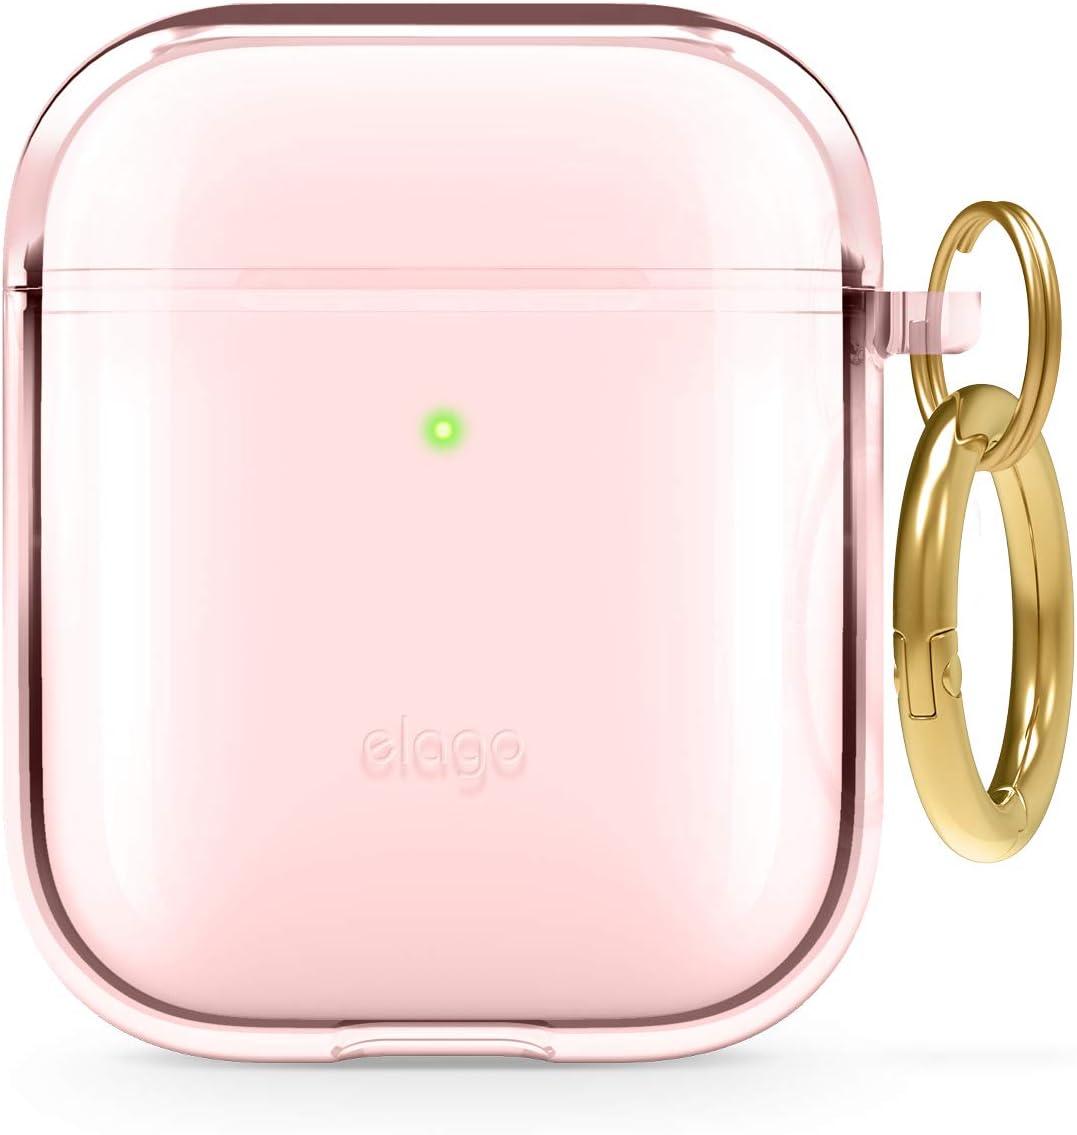 elago Funda TPU Clear Compatible con Apple AirPods 2&1 - Premium TPU, Reduce Amarilleo, Libre de Mancha, Soporte la Carga Inalámbrica (Lovely Rosa)